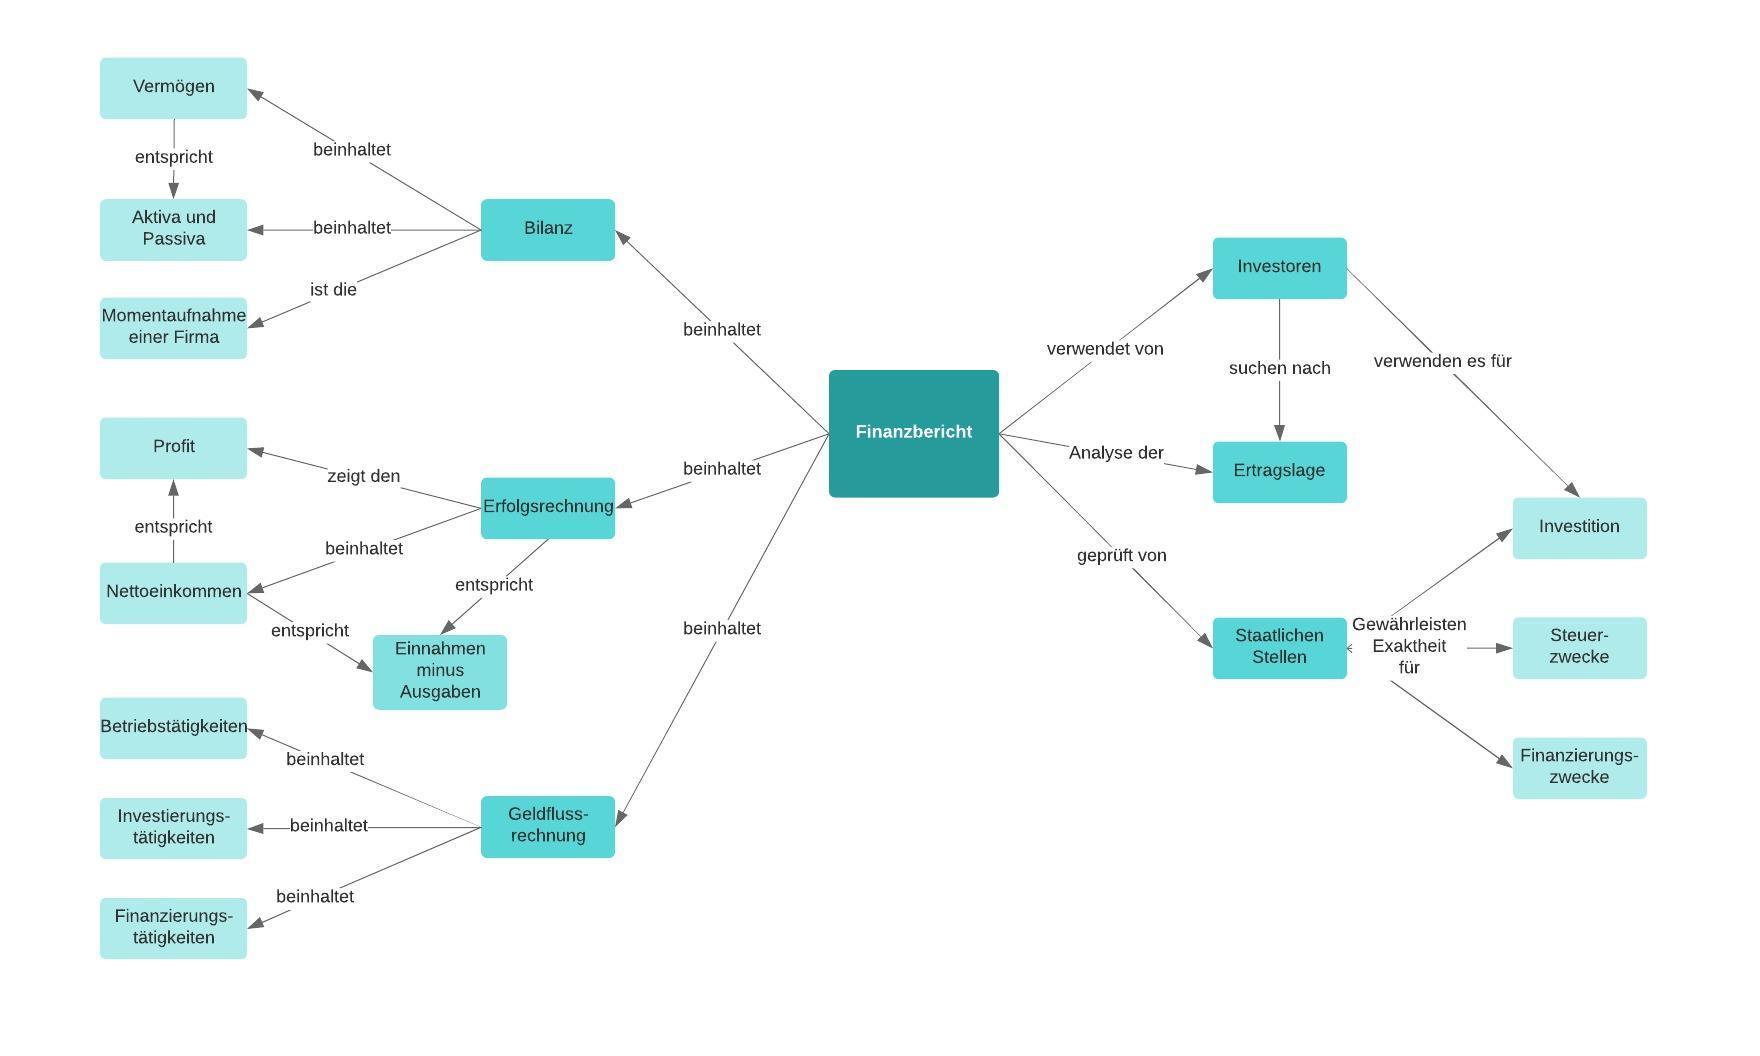 Finanzbericht Concept Map Beispiel